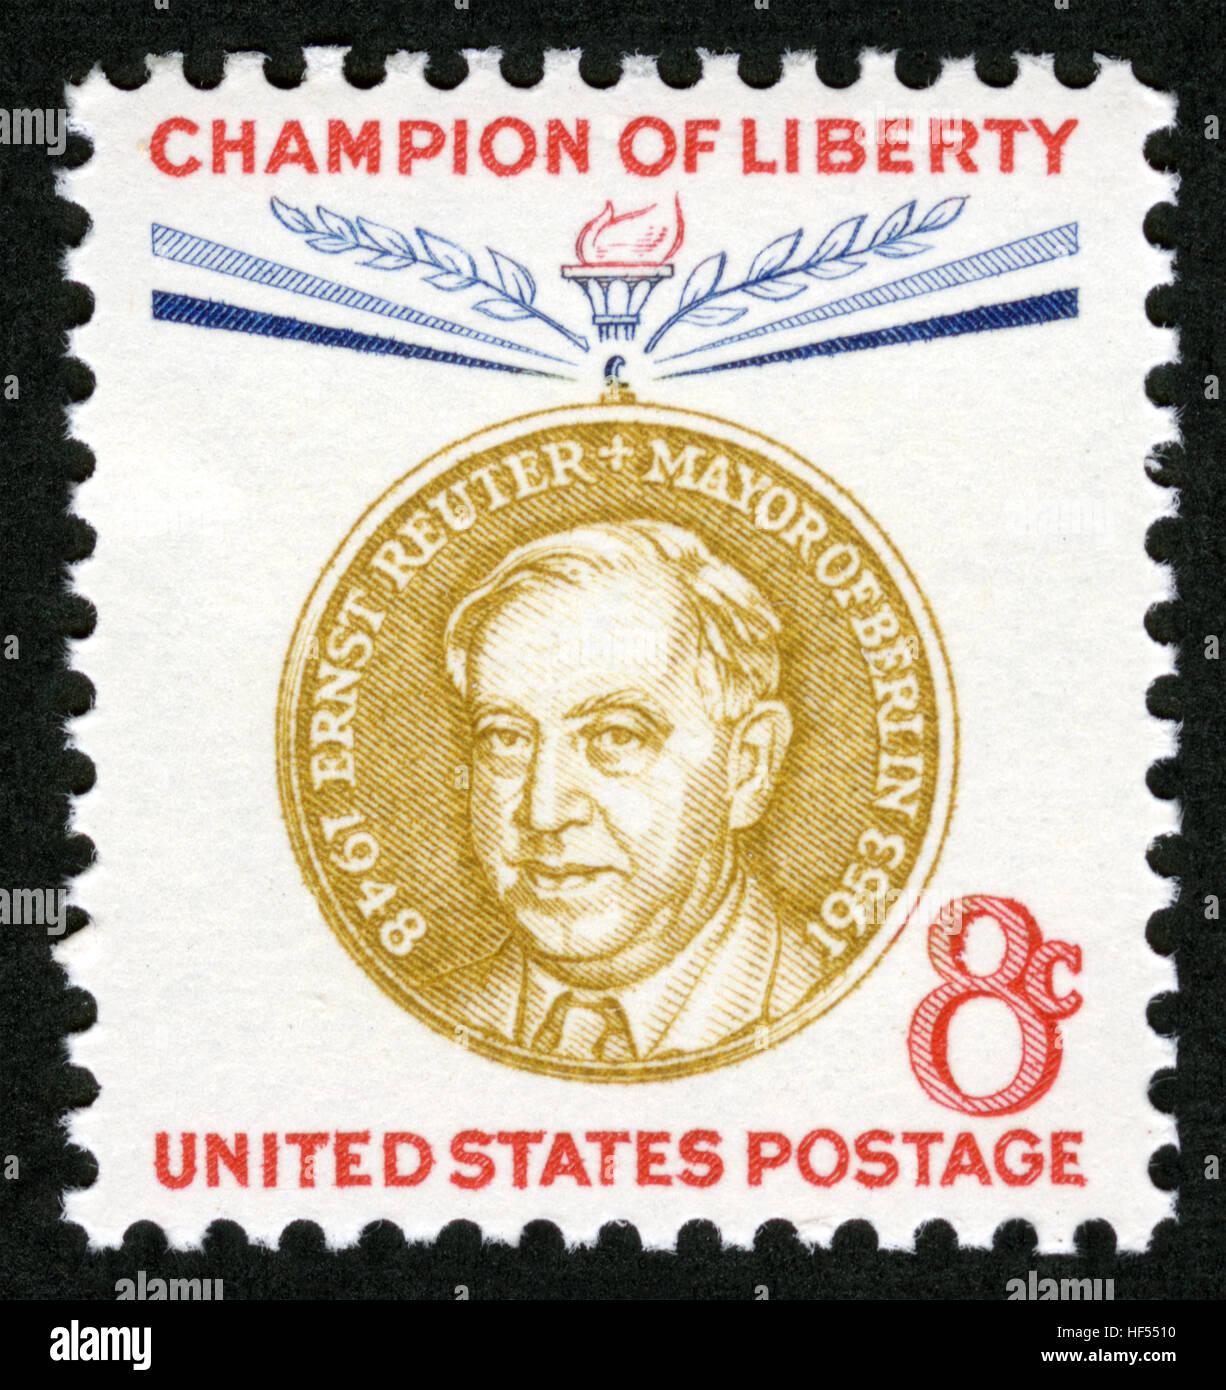 US Postage Stamp Champion Liberty Ernst Reuter Mayor Of Berlin 1948 1953